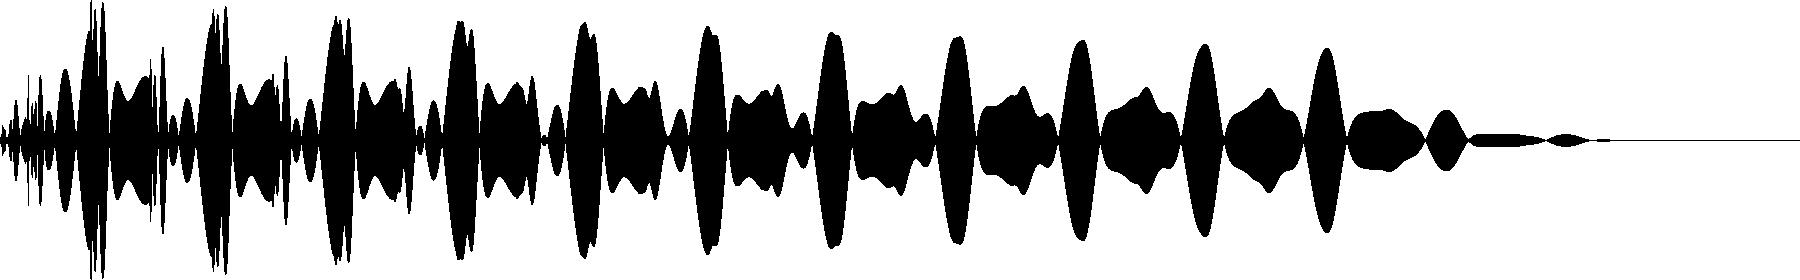 vedh bass cut 013 g